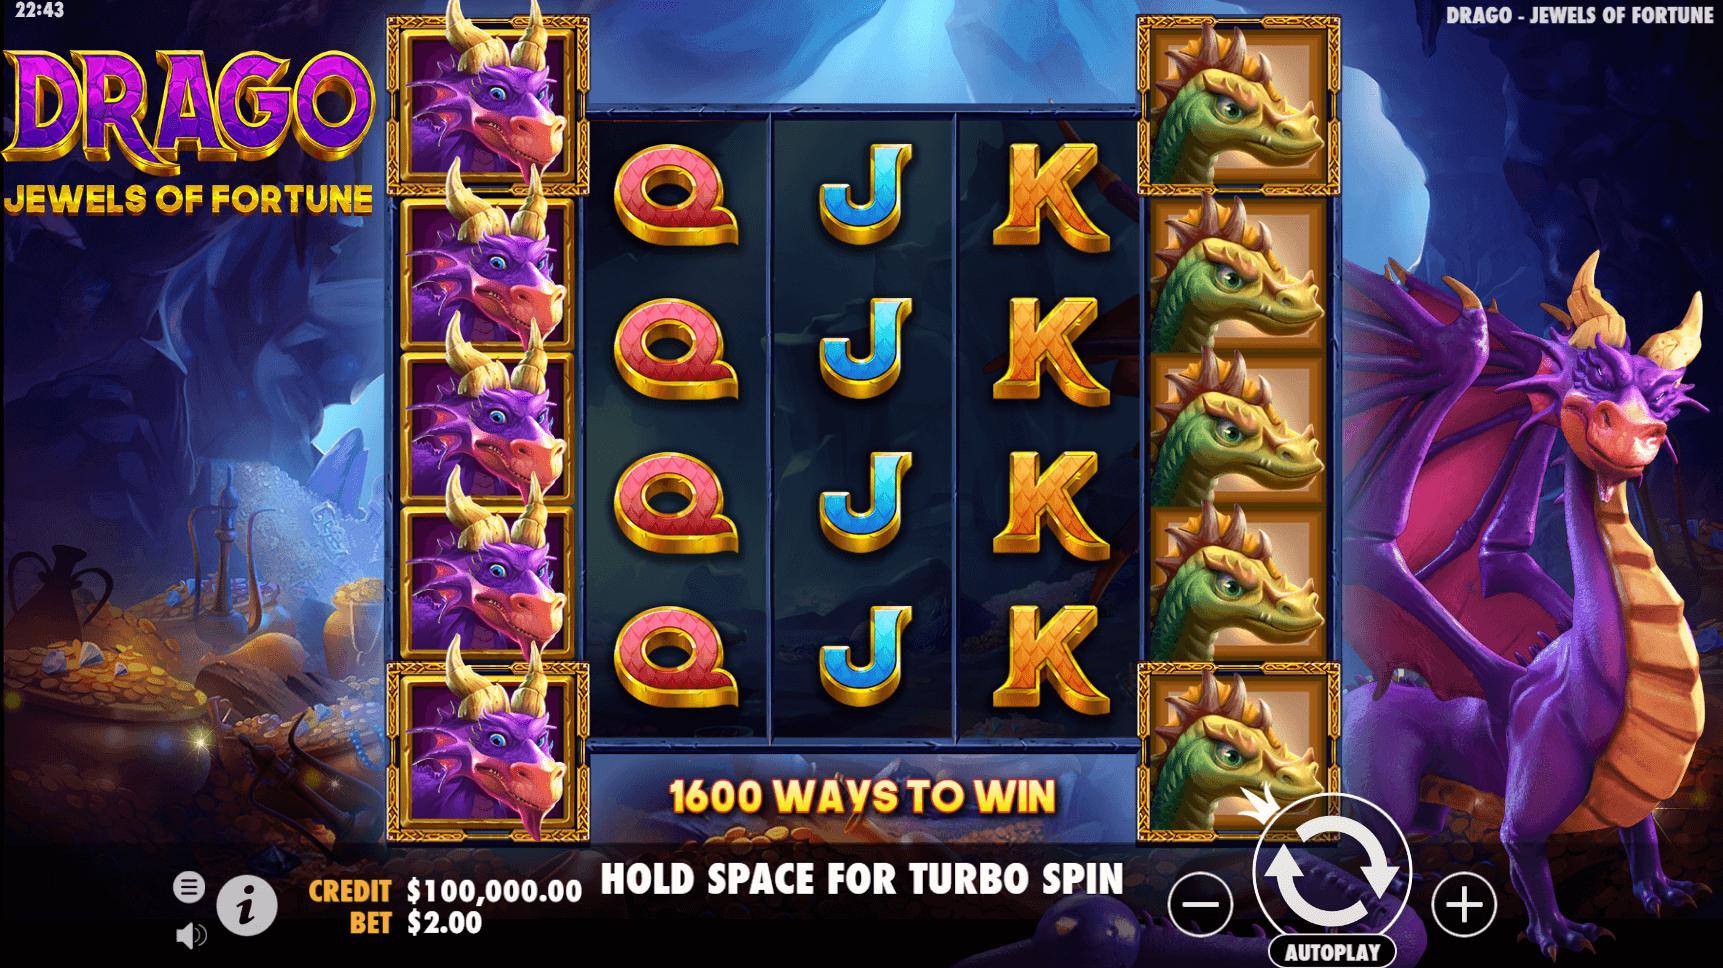 Drago Jewels of Fortune slot machine screenshot